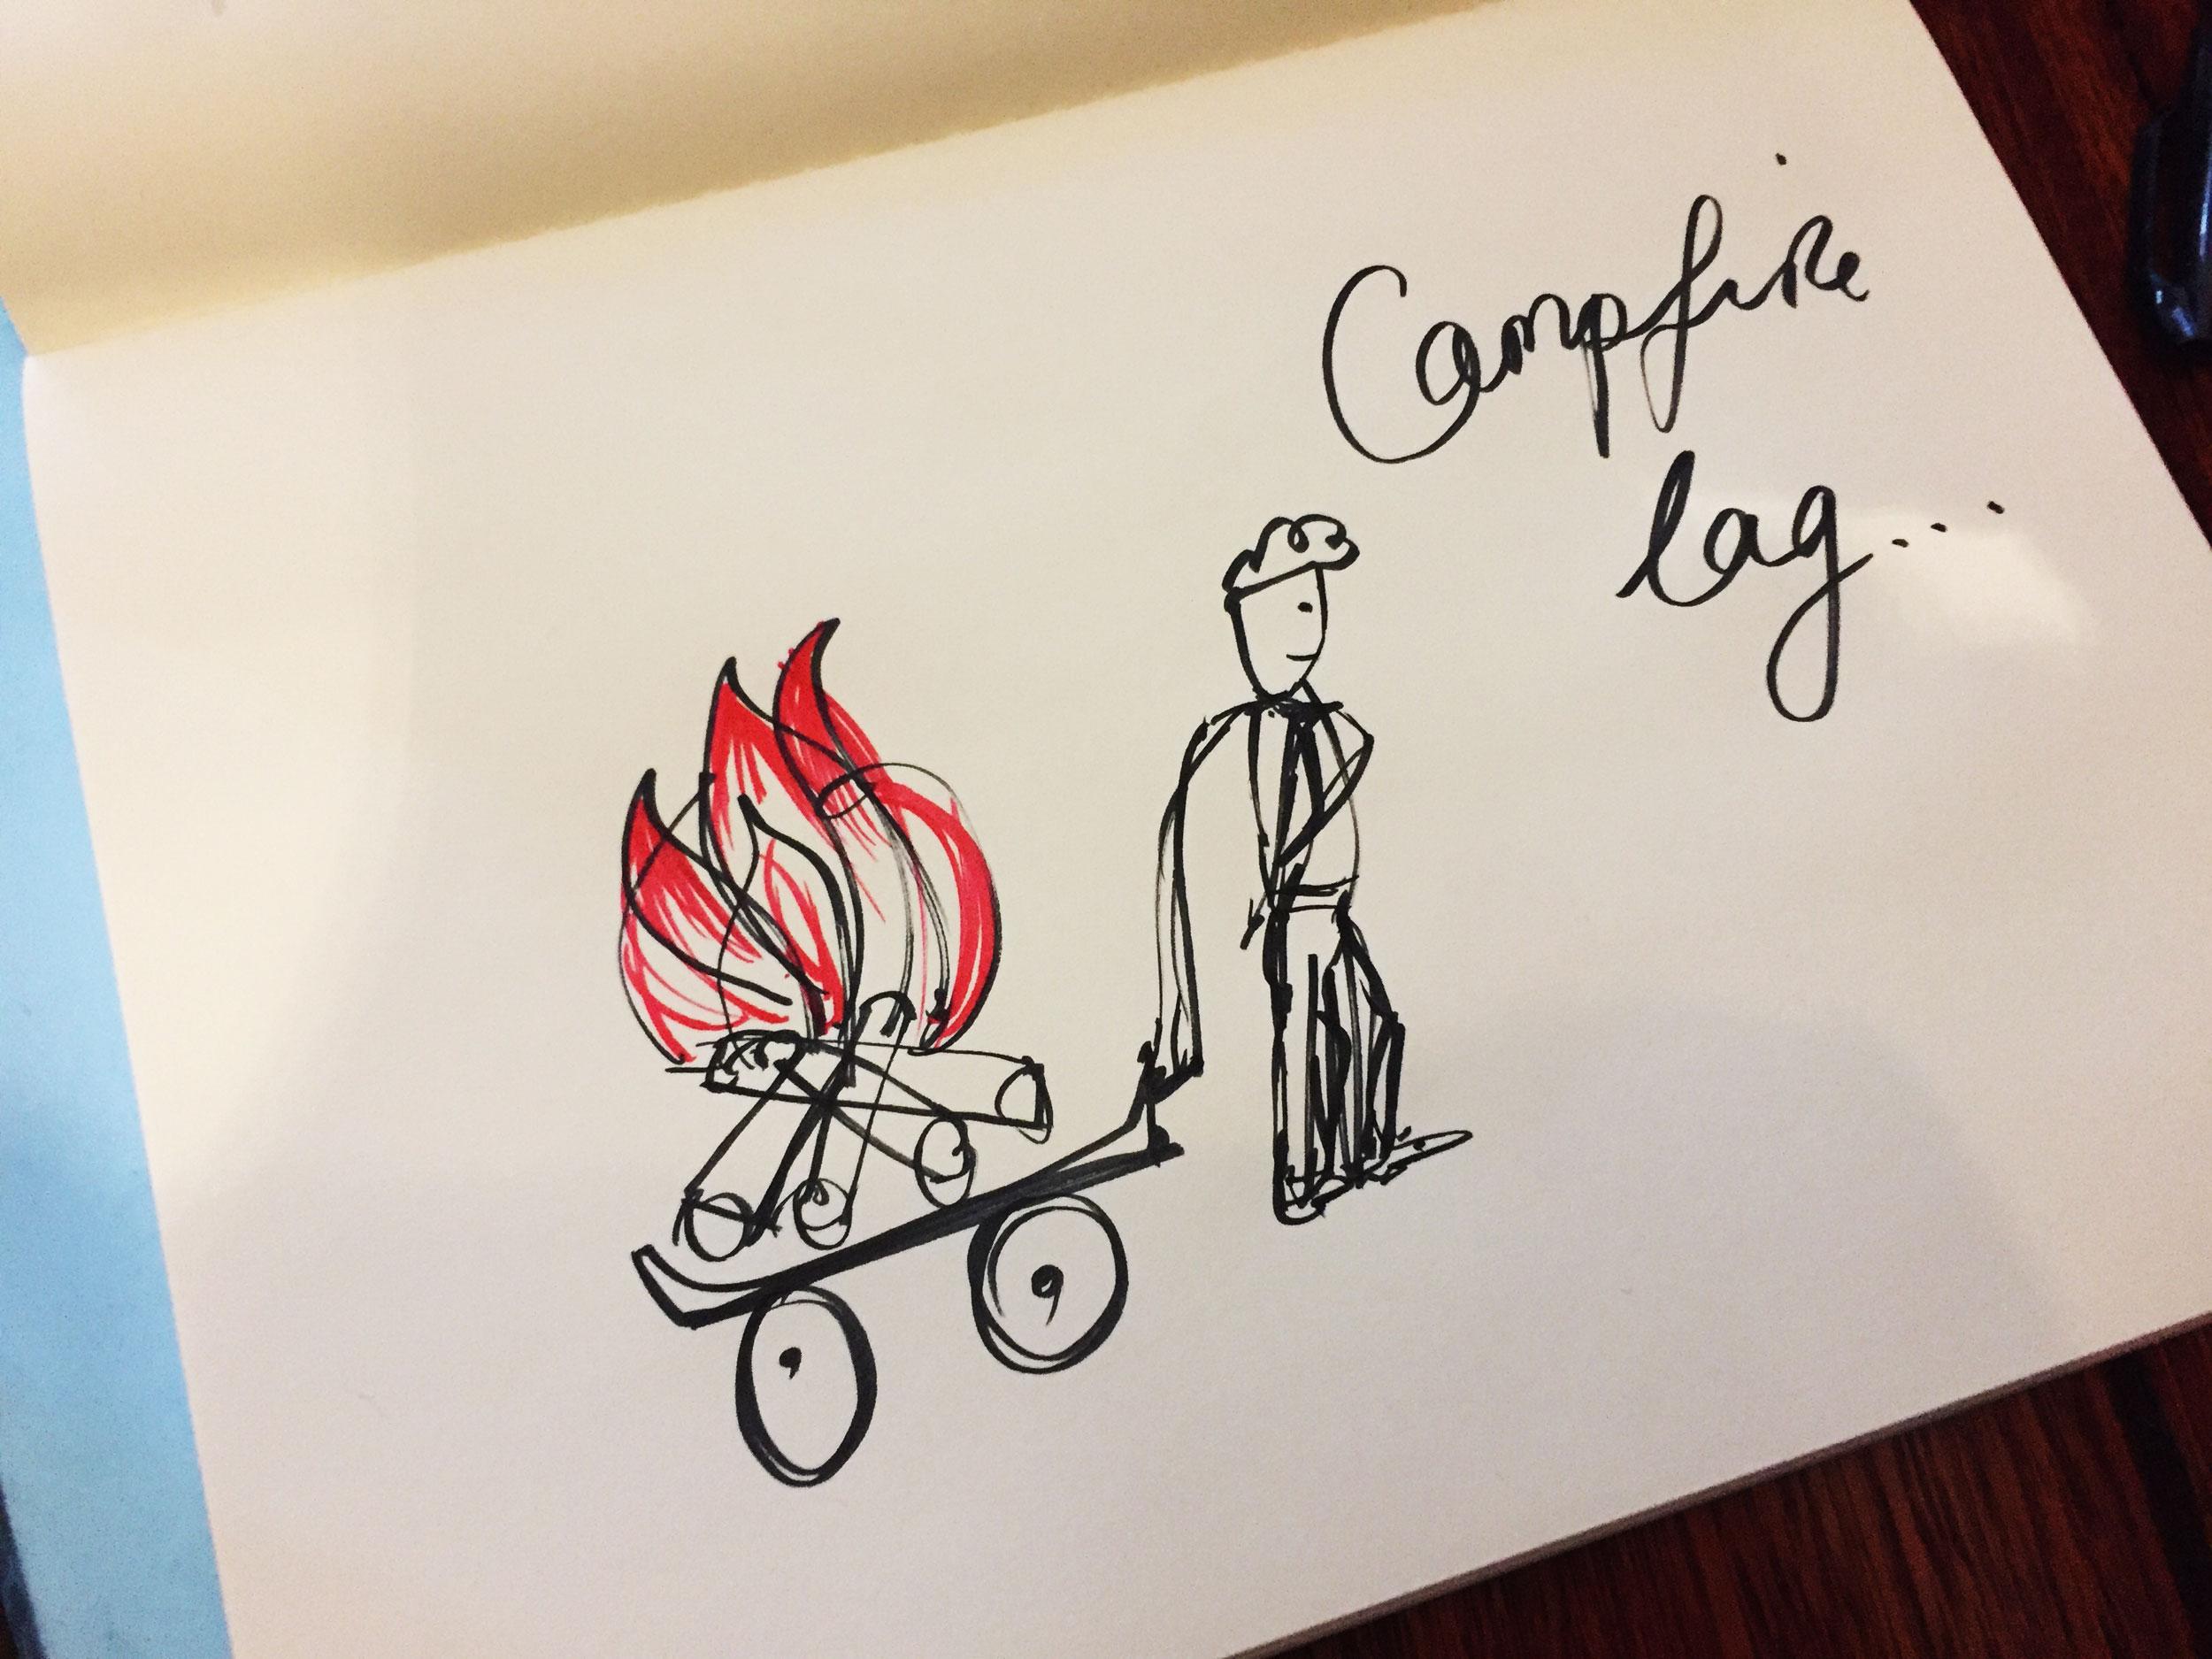 Campfire lag. Drawing Luke Hockley.